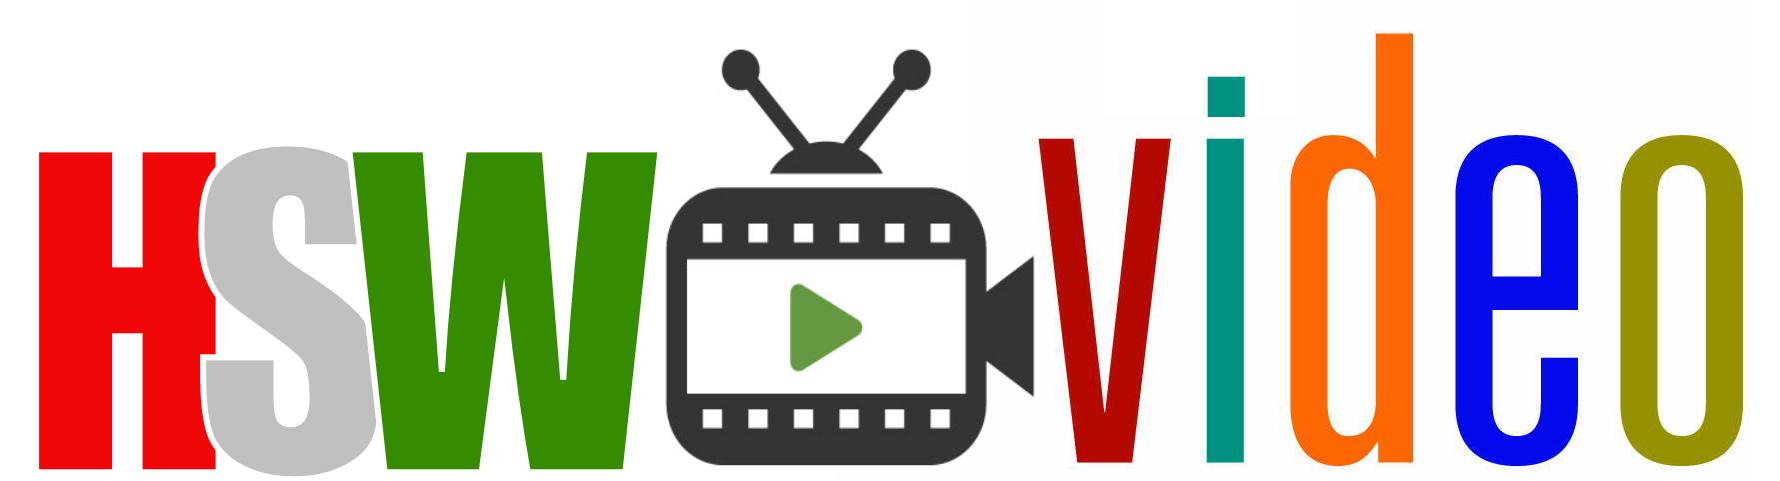 Elindult a HSW Video!